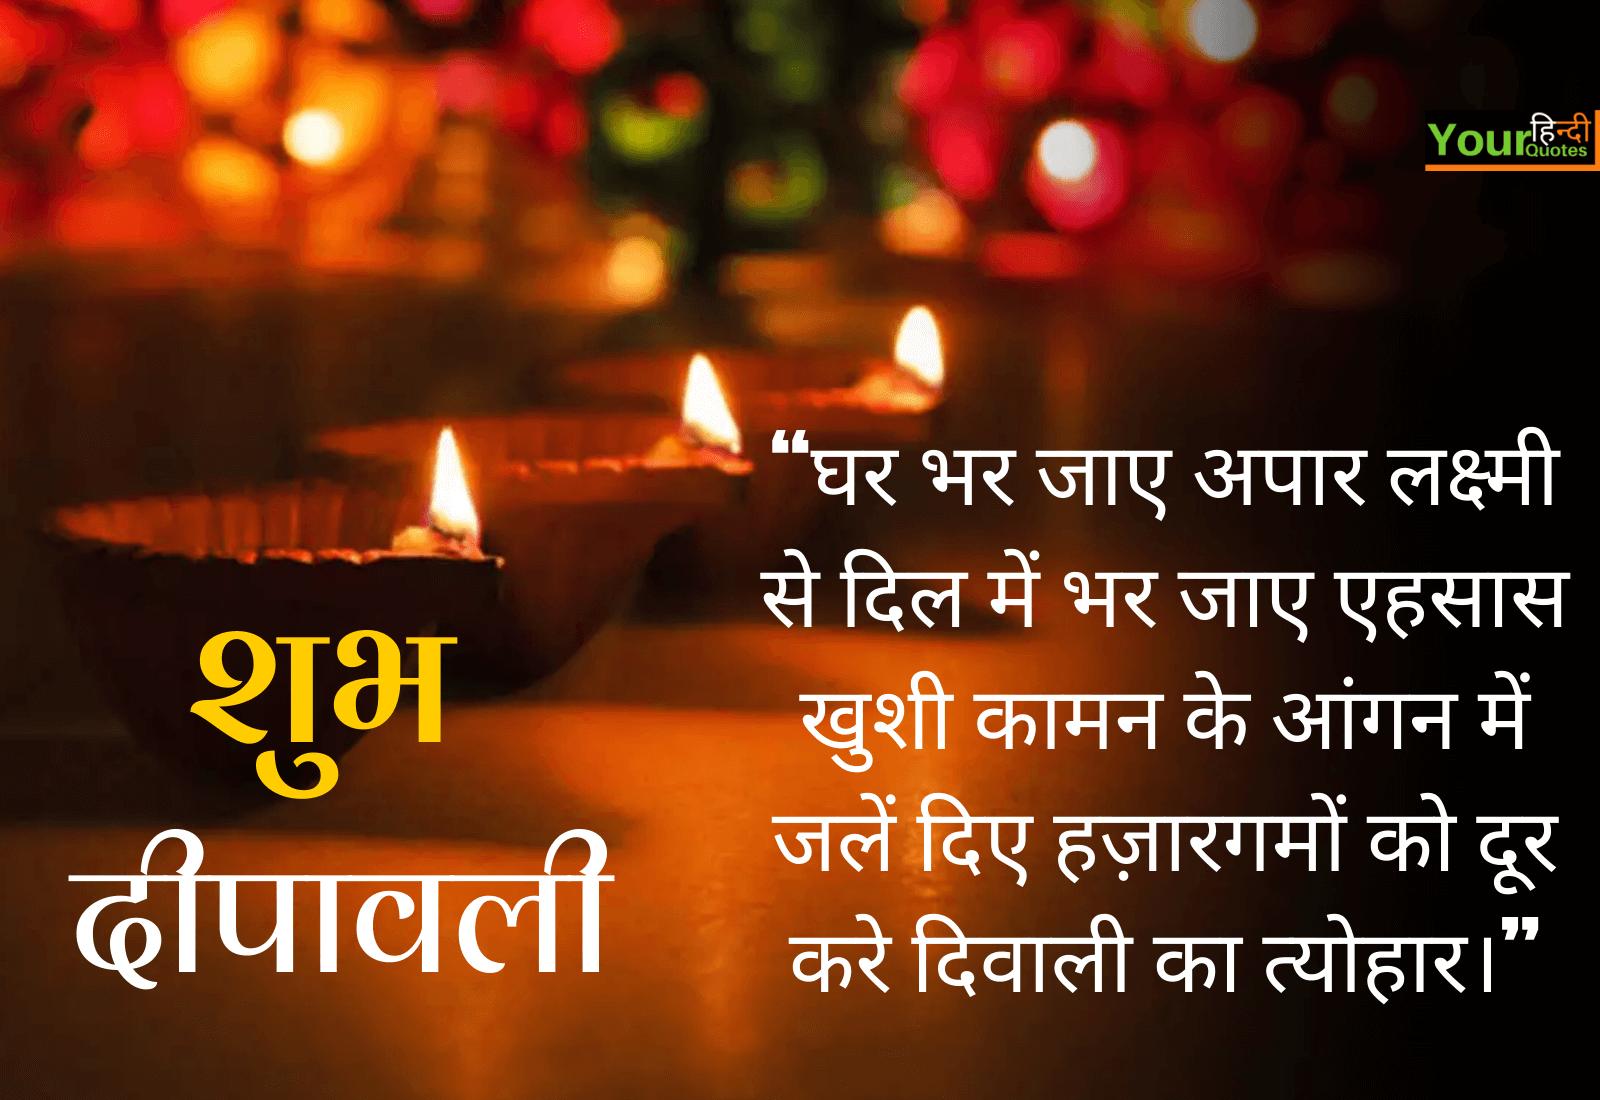 Happy DiwaliHindi picture